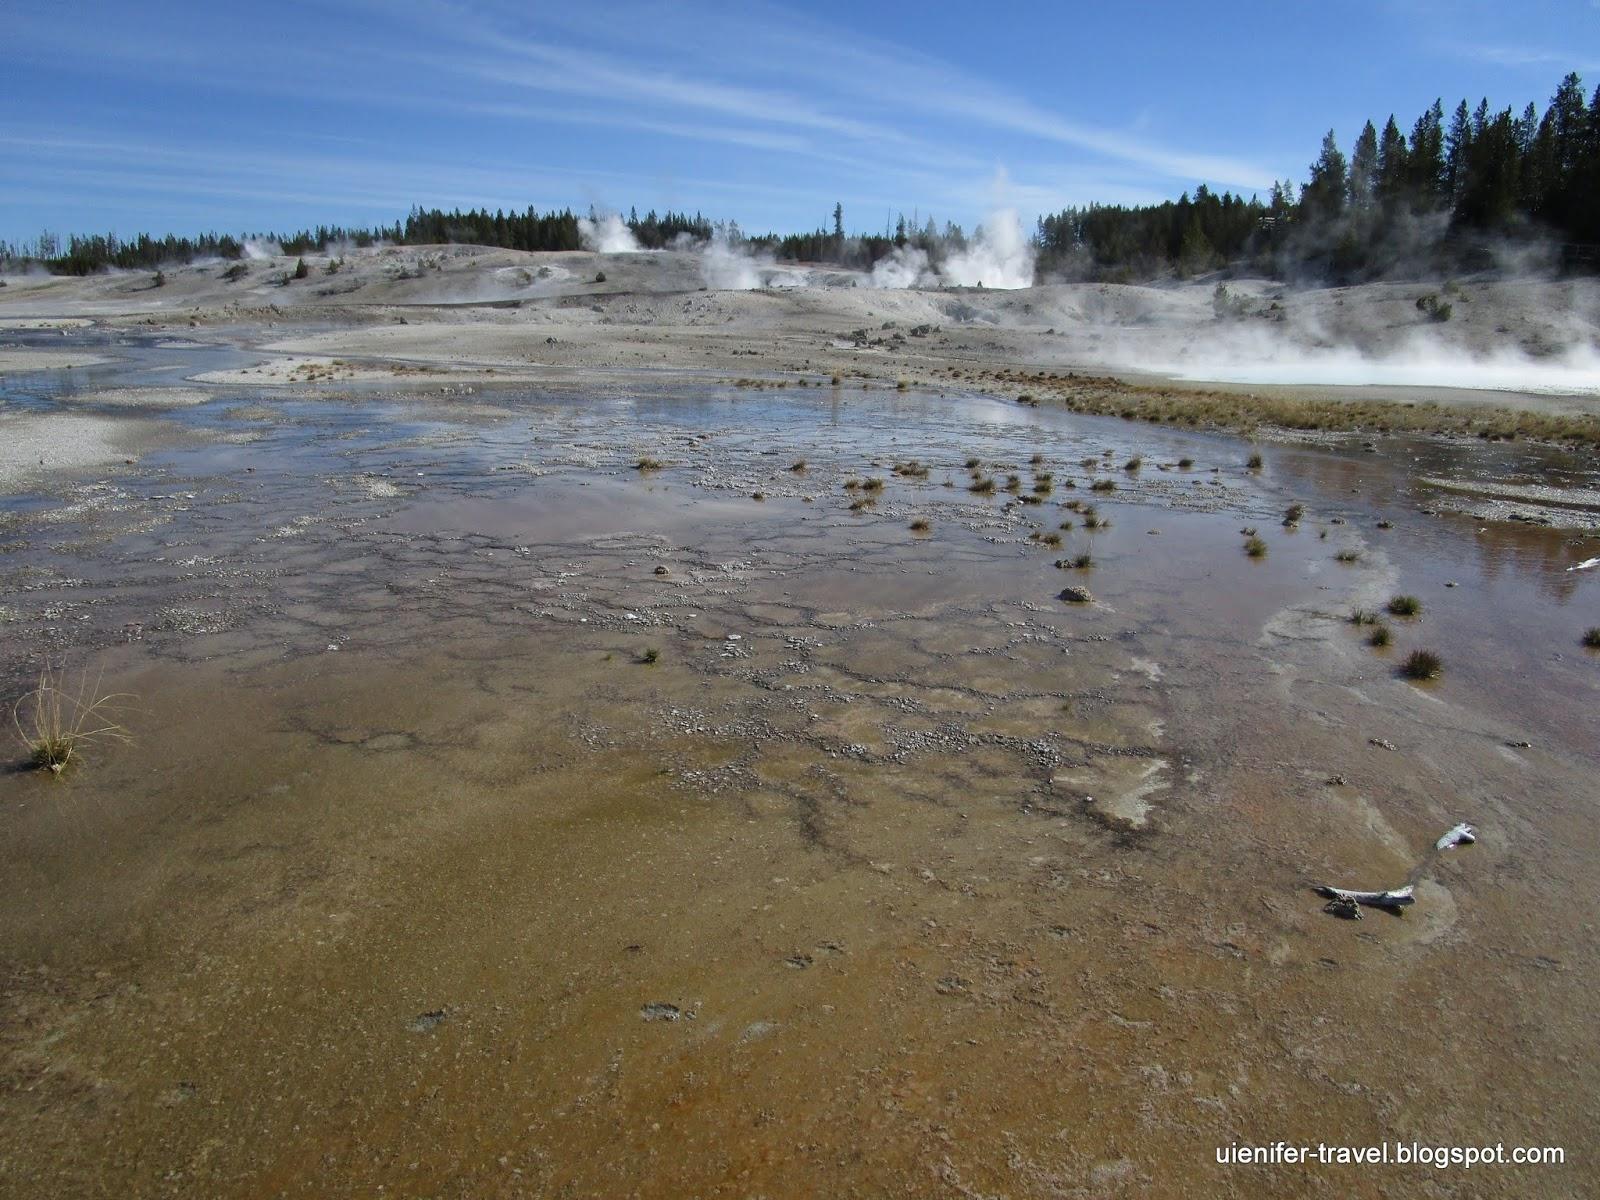 Гейзерный бассейн Норрис. Йеллоустоун, Вайоминг (Norris Geyser Basin. Yellowstone National Park, WY)